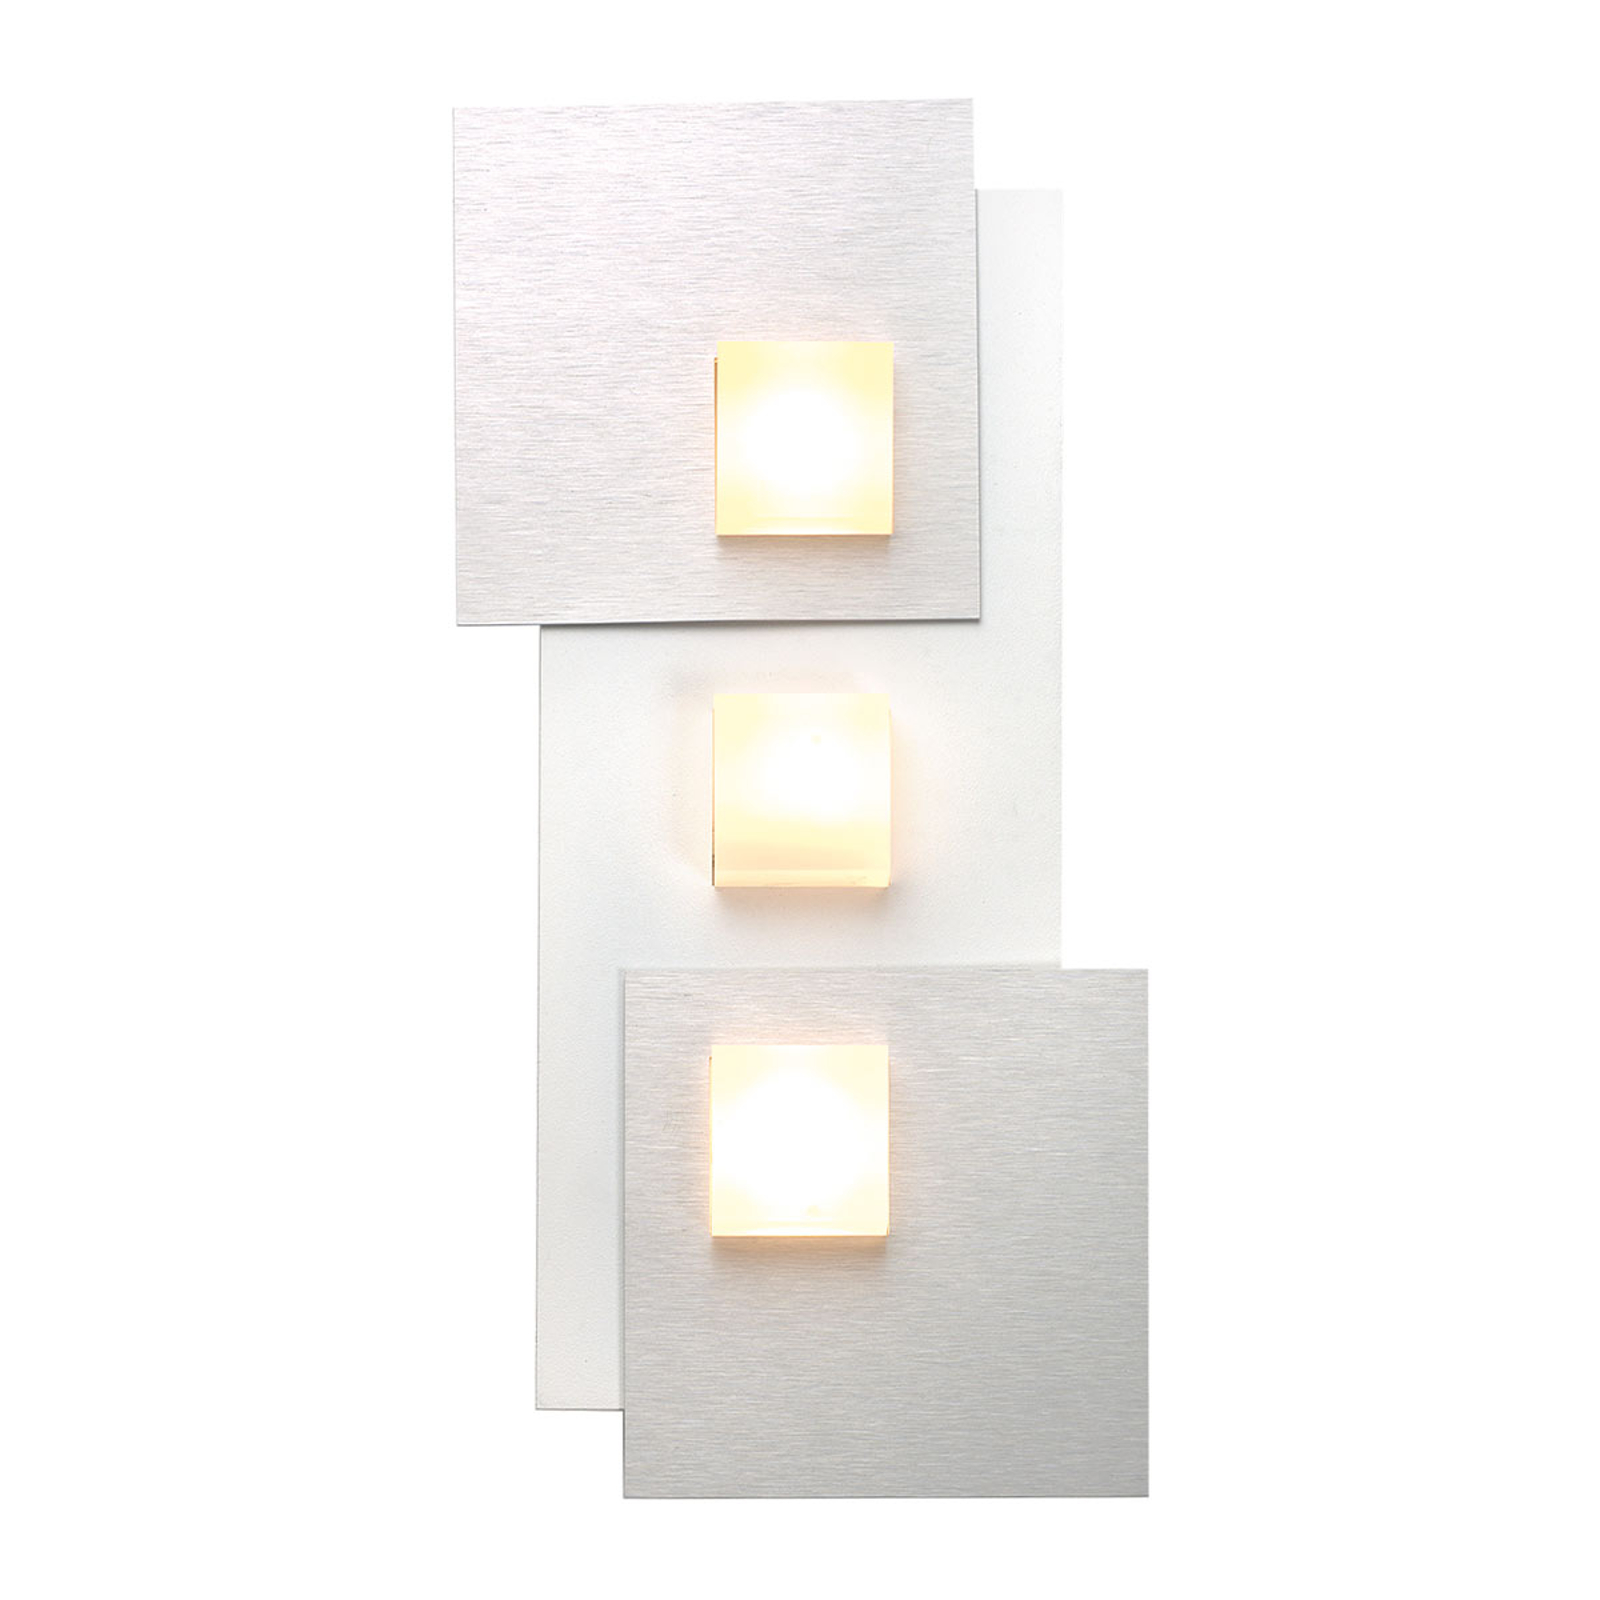 Bopp Pixel 2.0 LED-Deckenleuchte 3-flammig alu